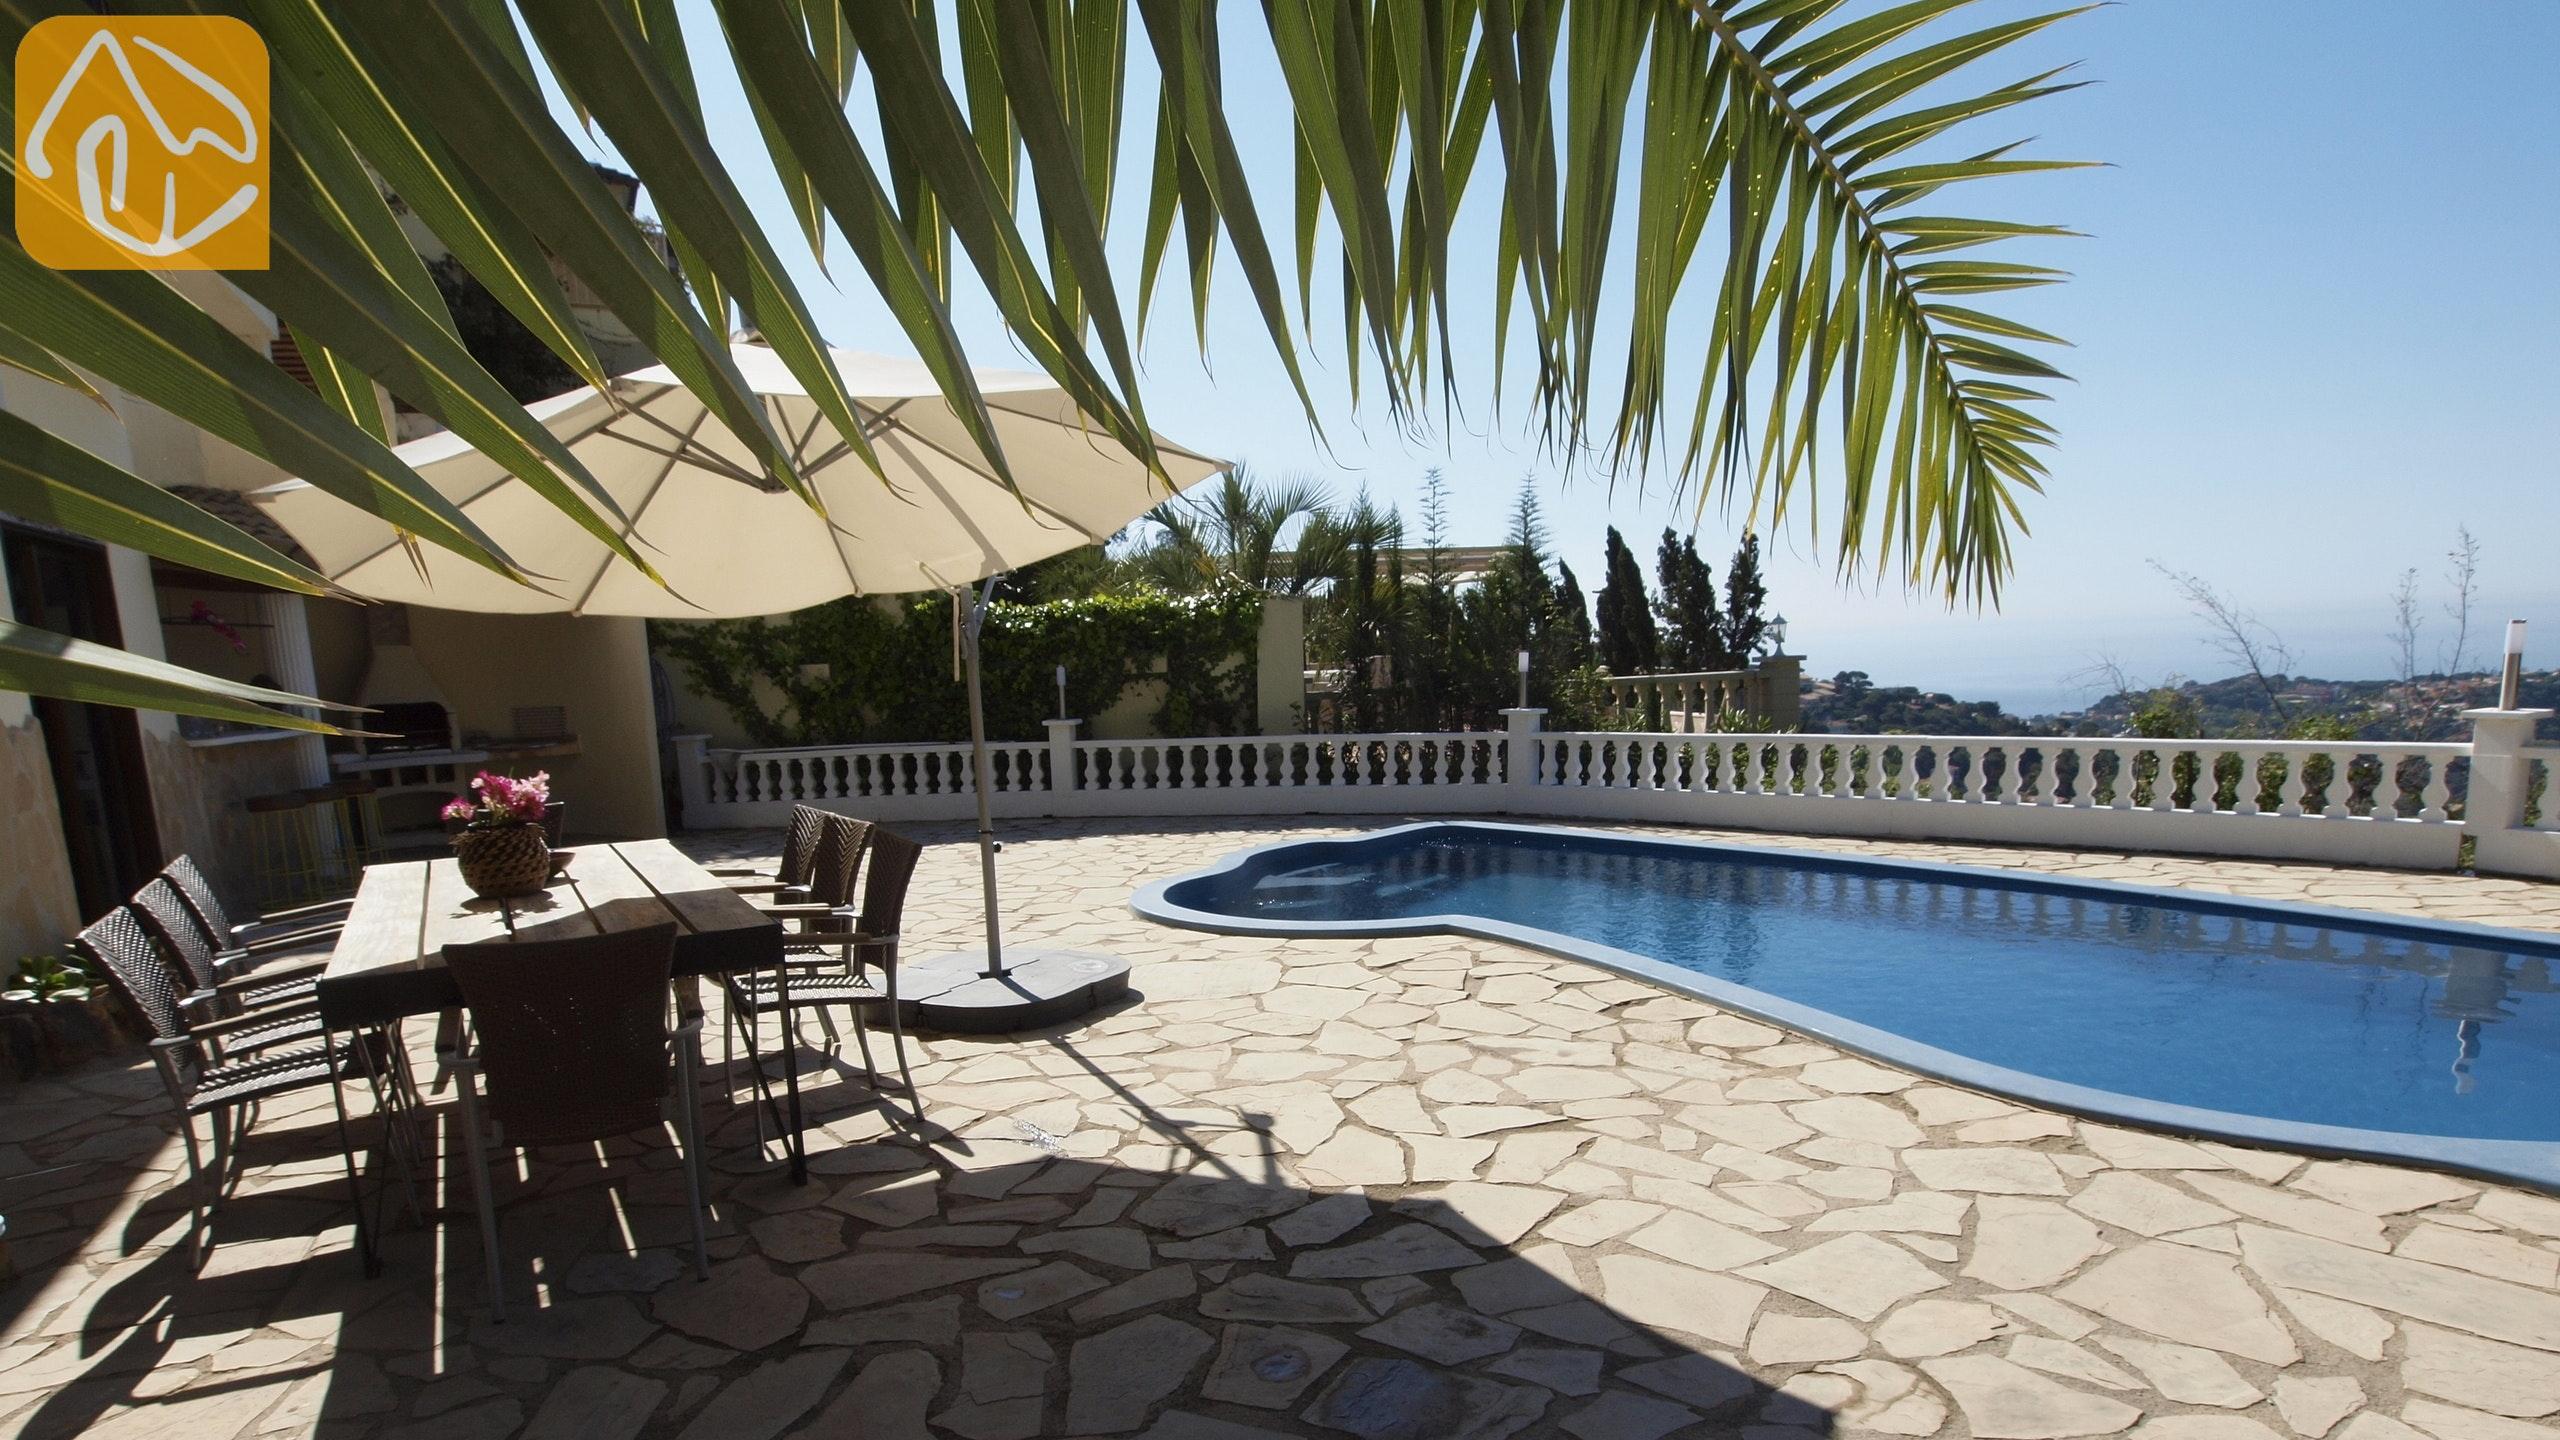 Charming Holiday Villas Costa Brava Spain   Villa Monroe   Swimming Pool